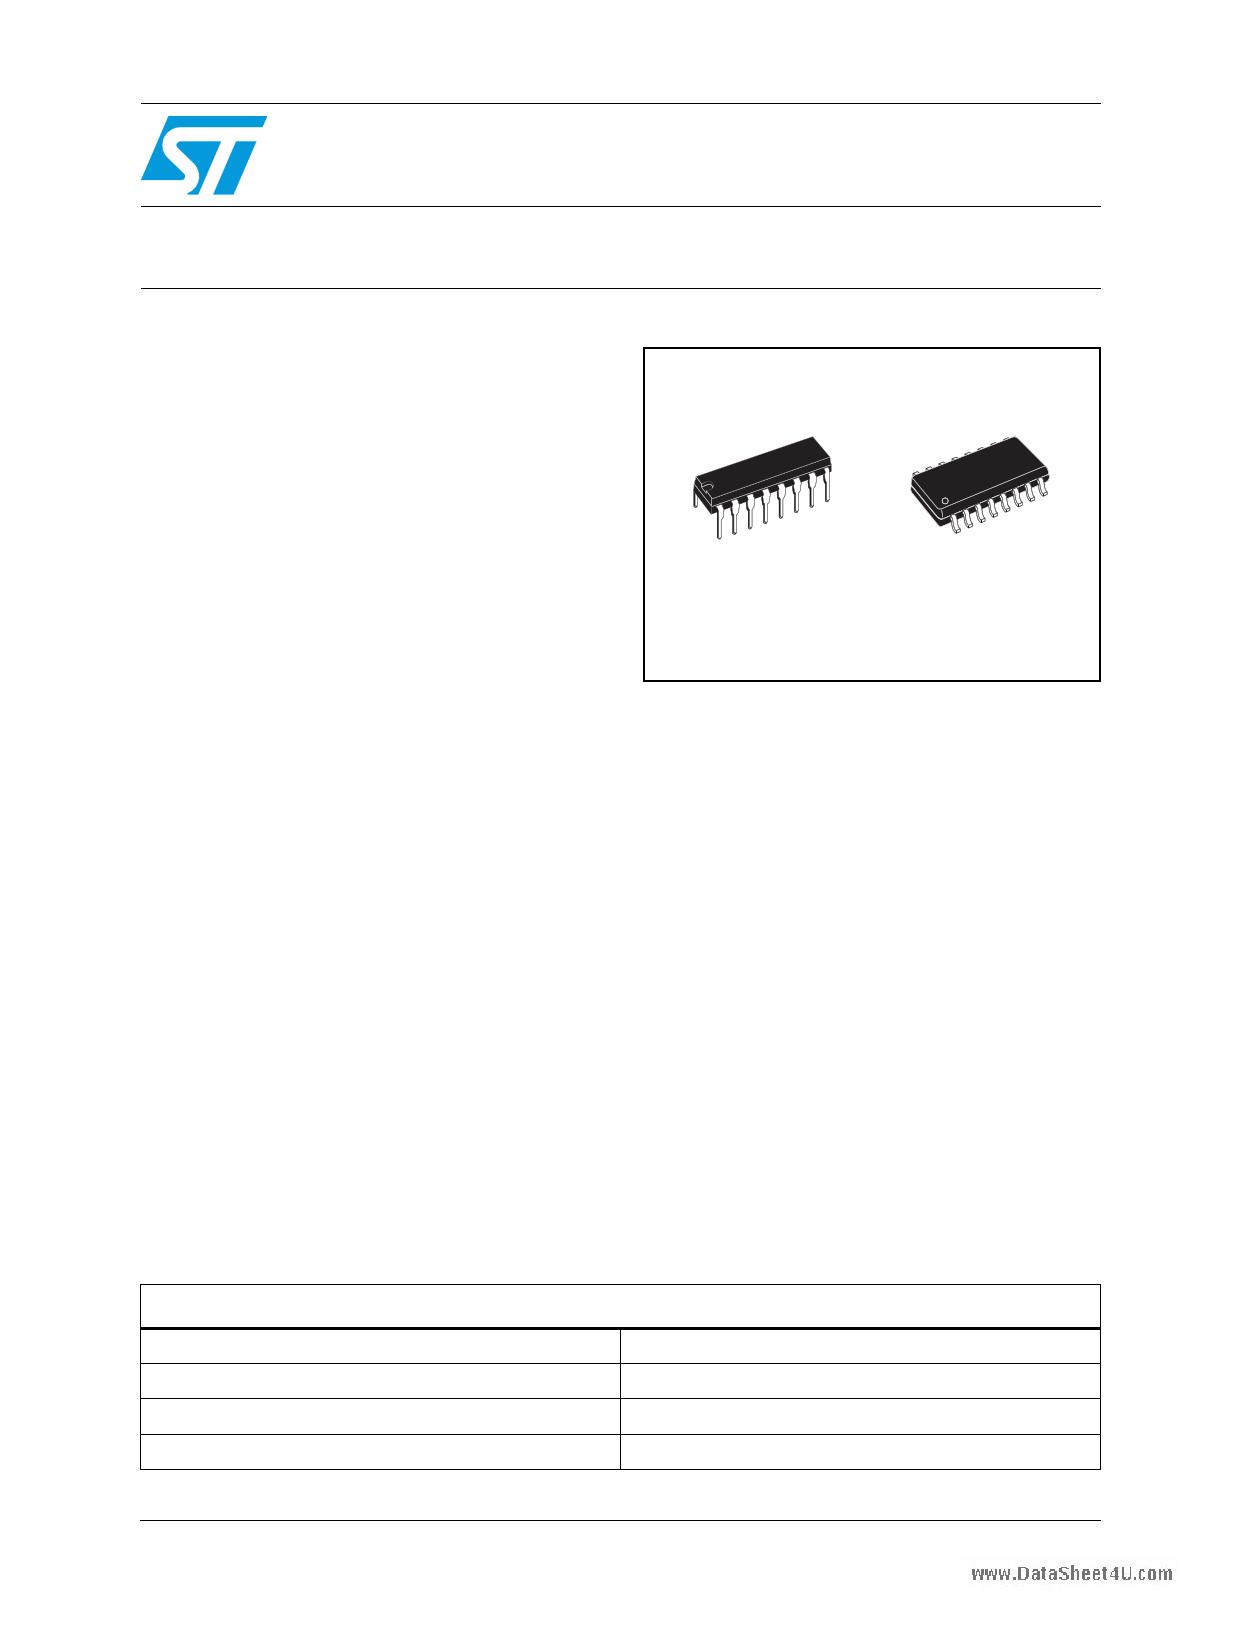 E-ULN200xA دیتاشیت PDF